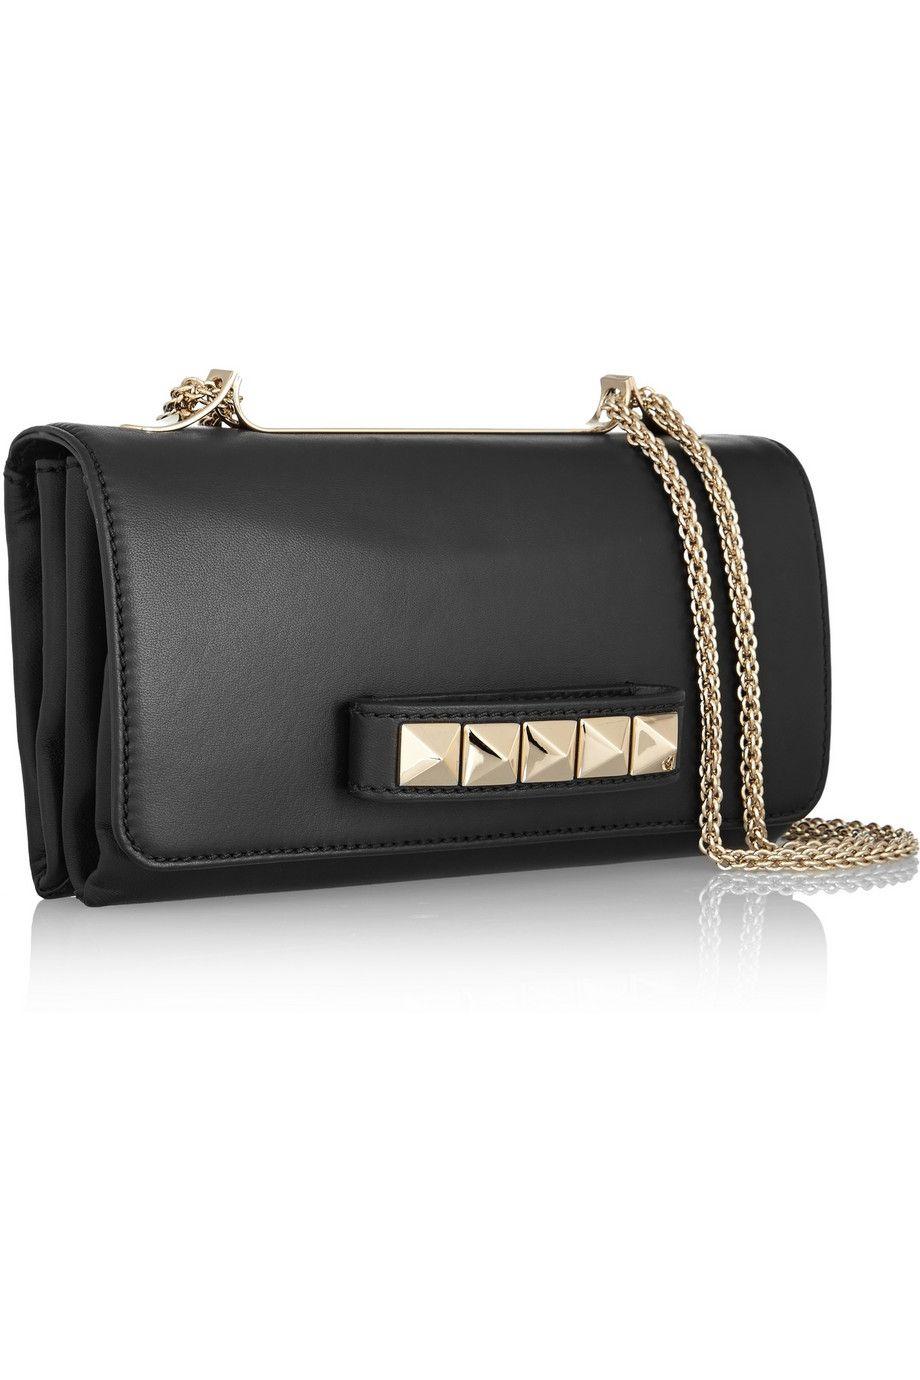 Valentino Pre-owned - Black Leather Handbag Vavavoom 88KyNRspST